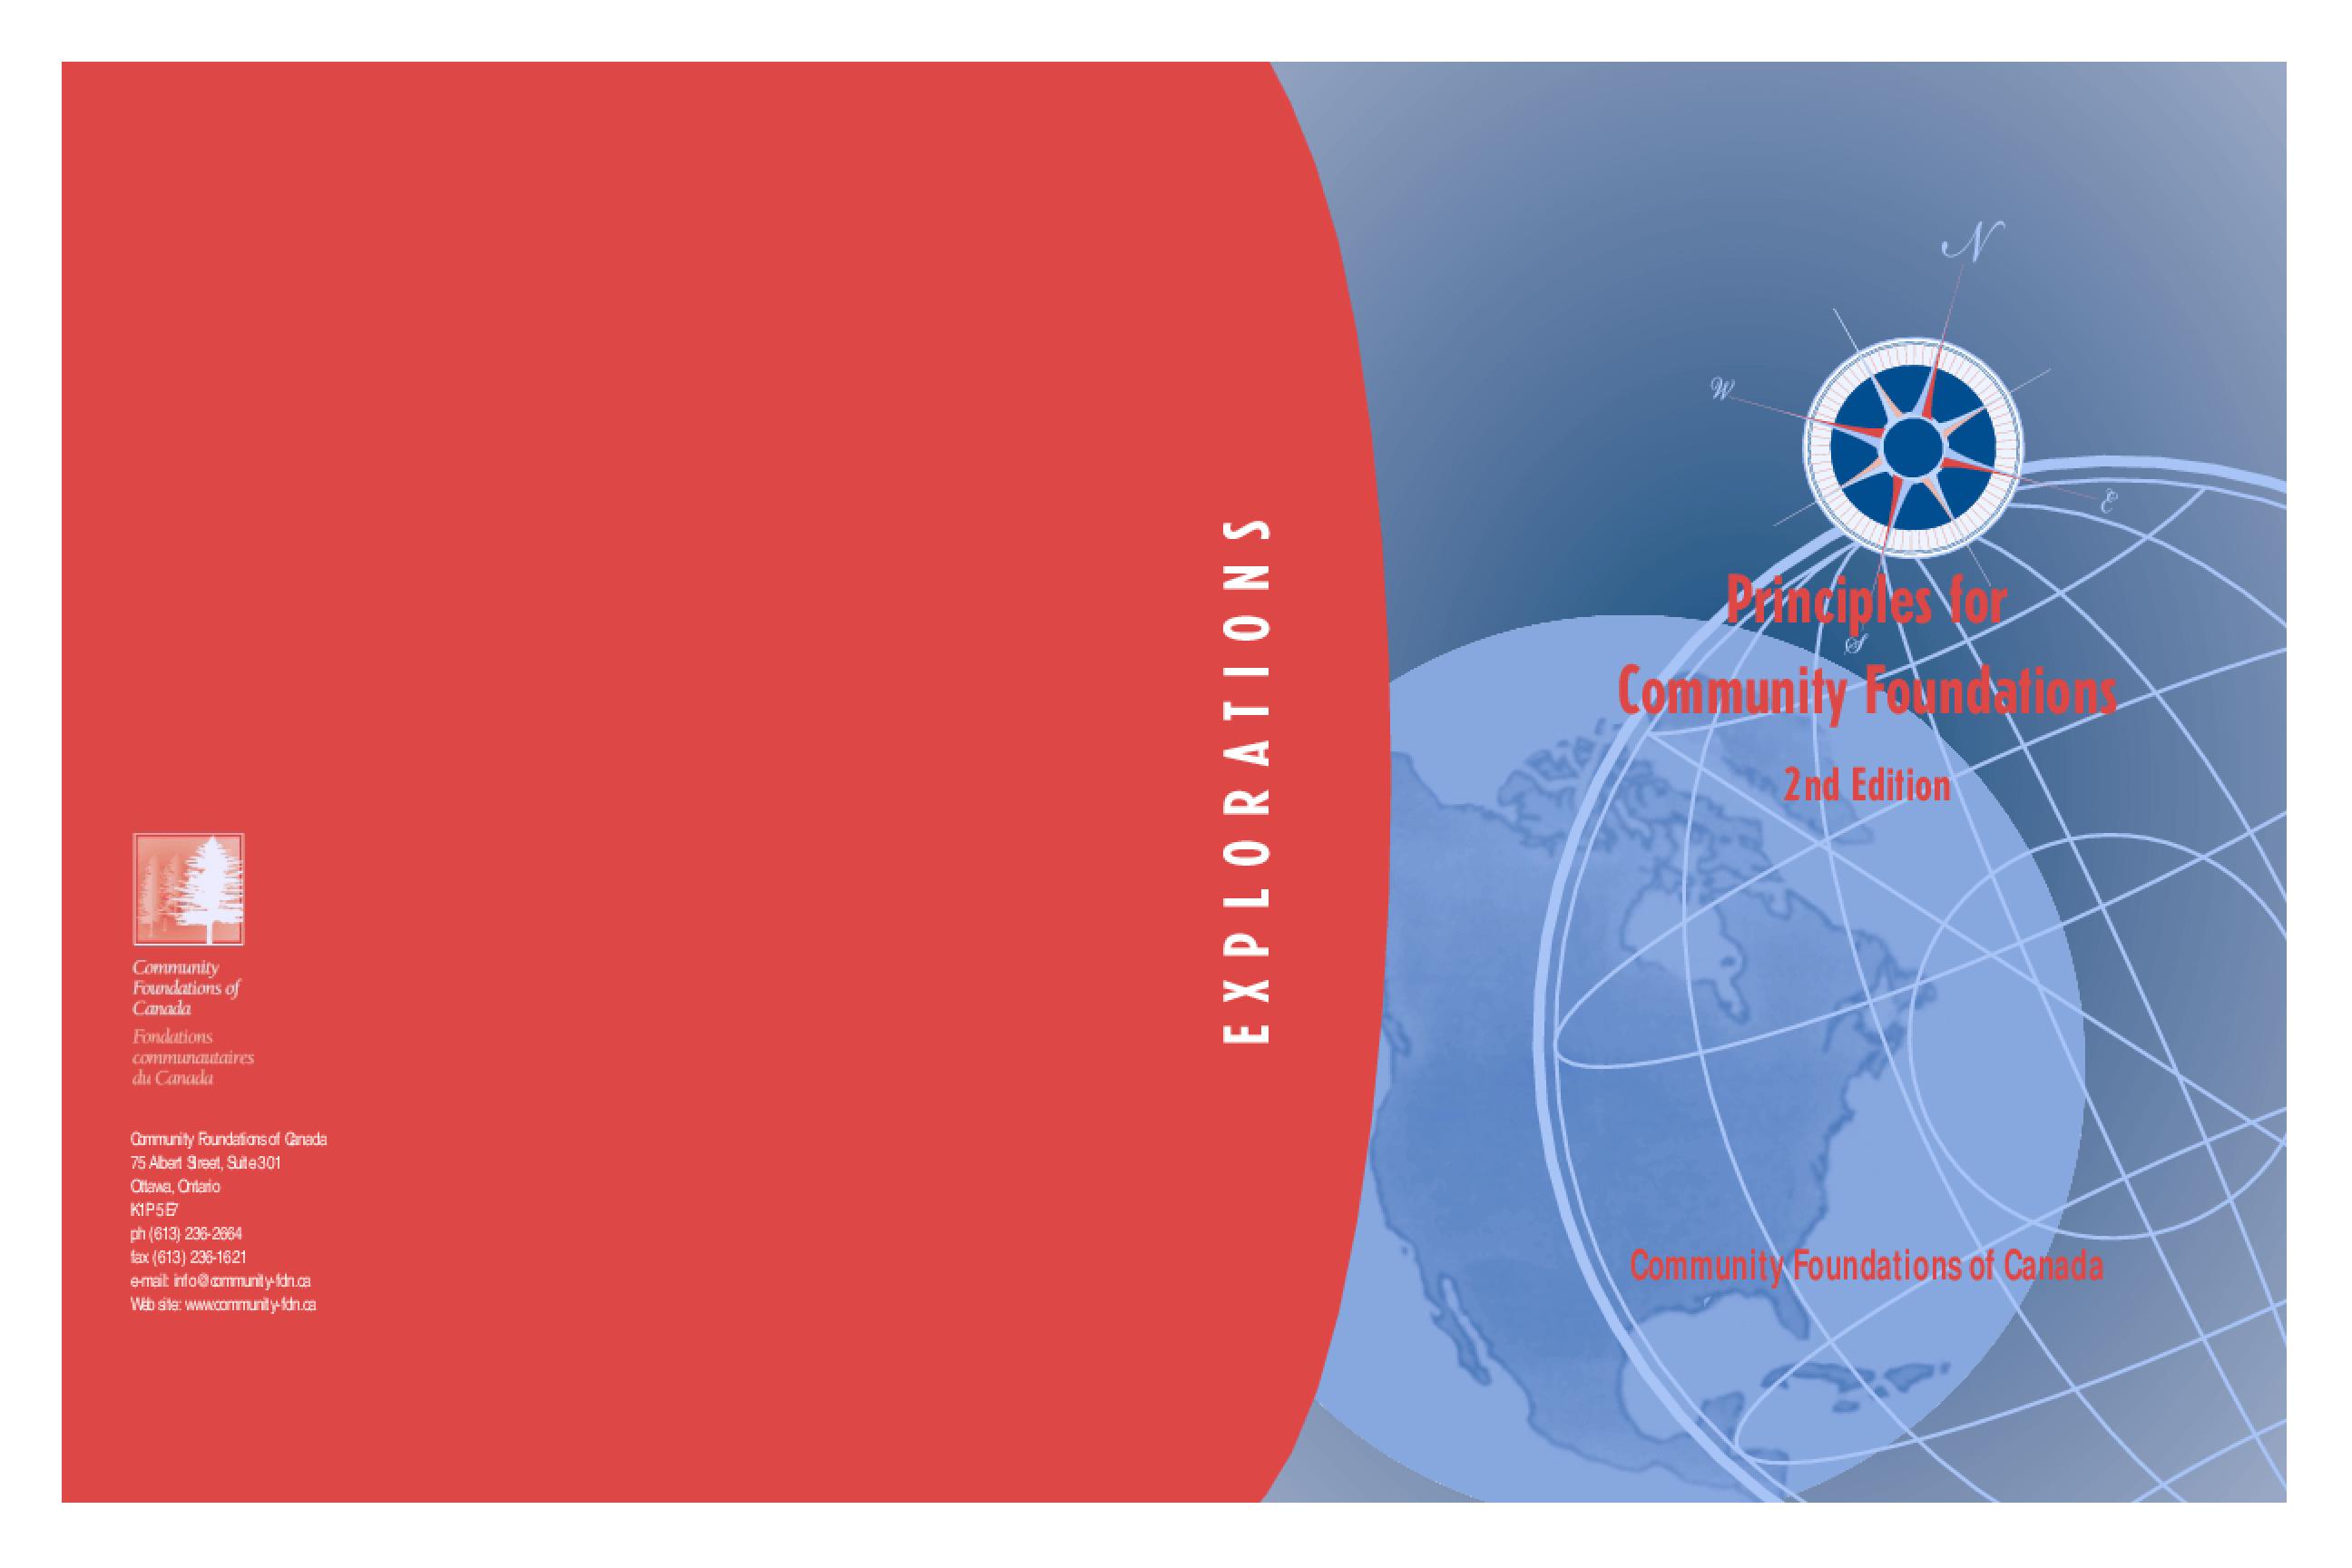 Community Foundations of Canada. Explorations: Principles For Community Foundations